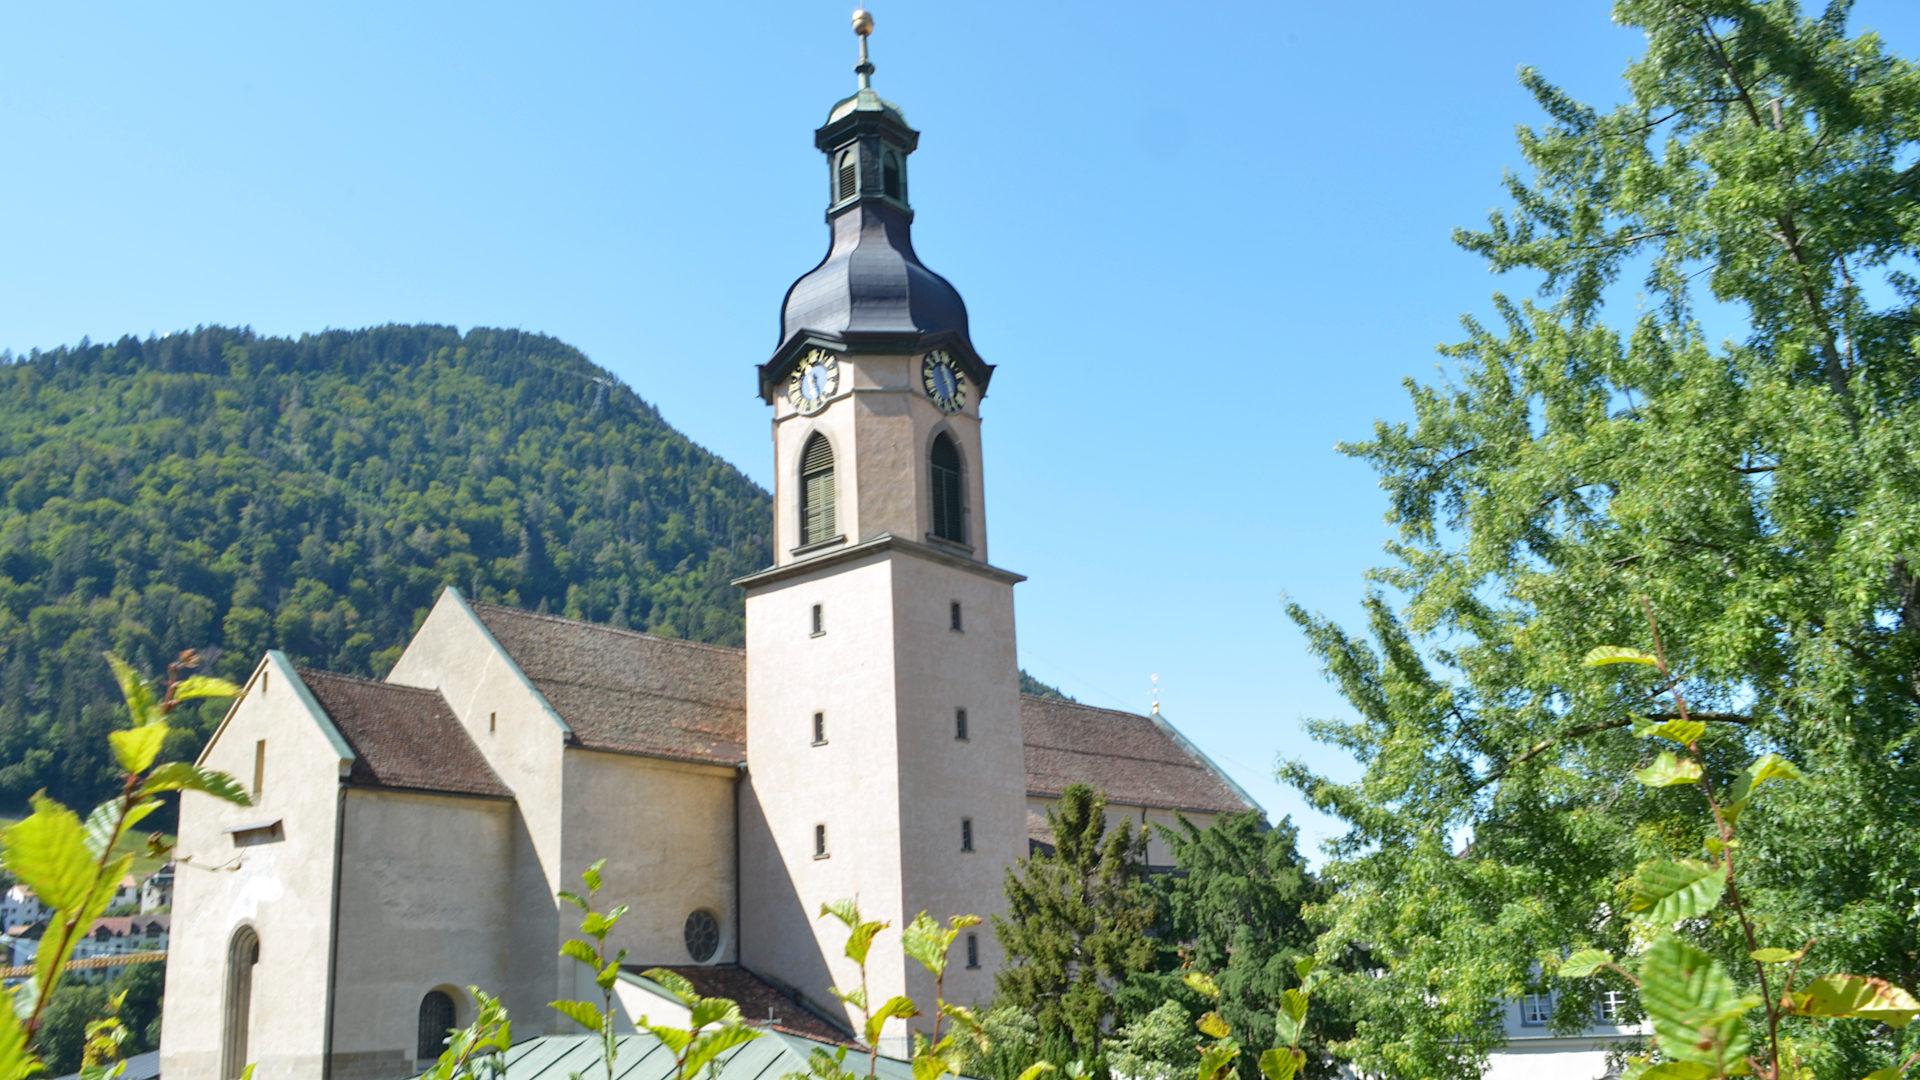 Kathedrale von Chur | © Regula Pfeifer